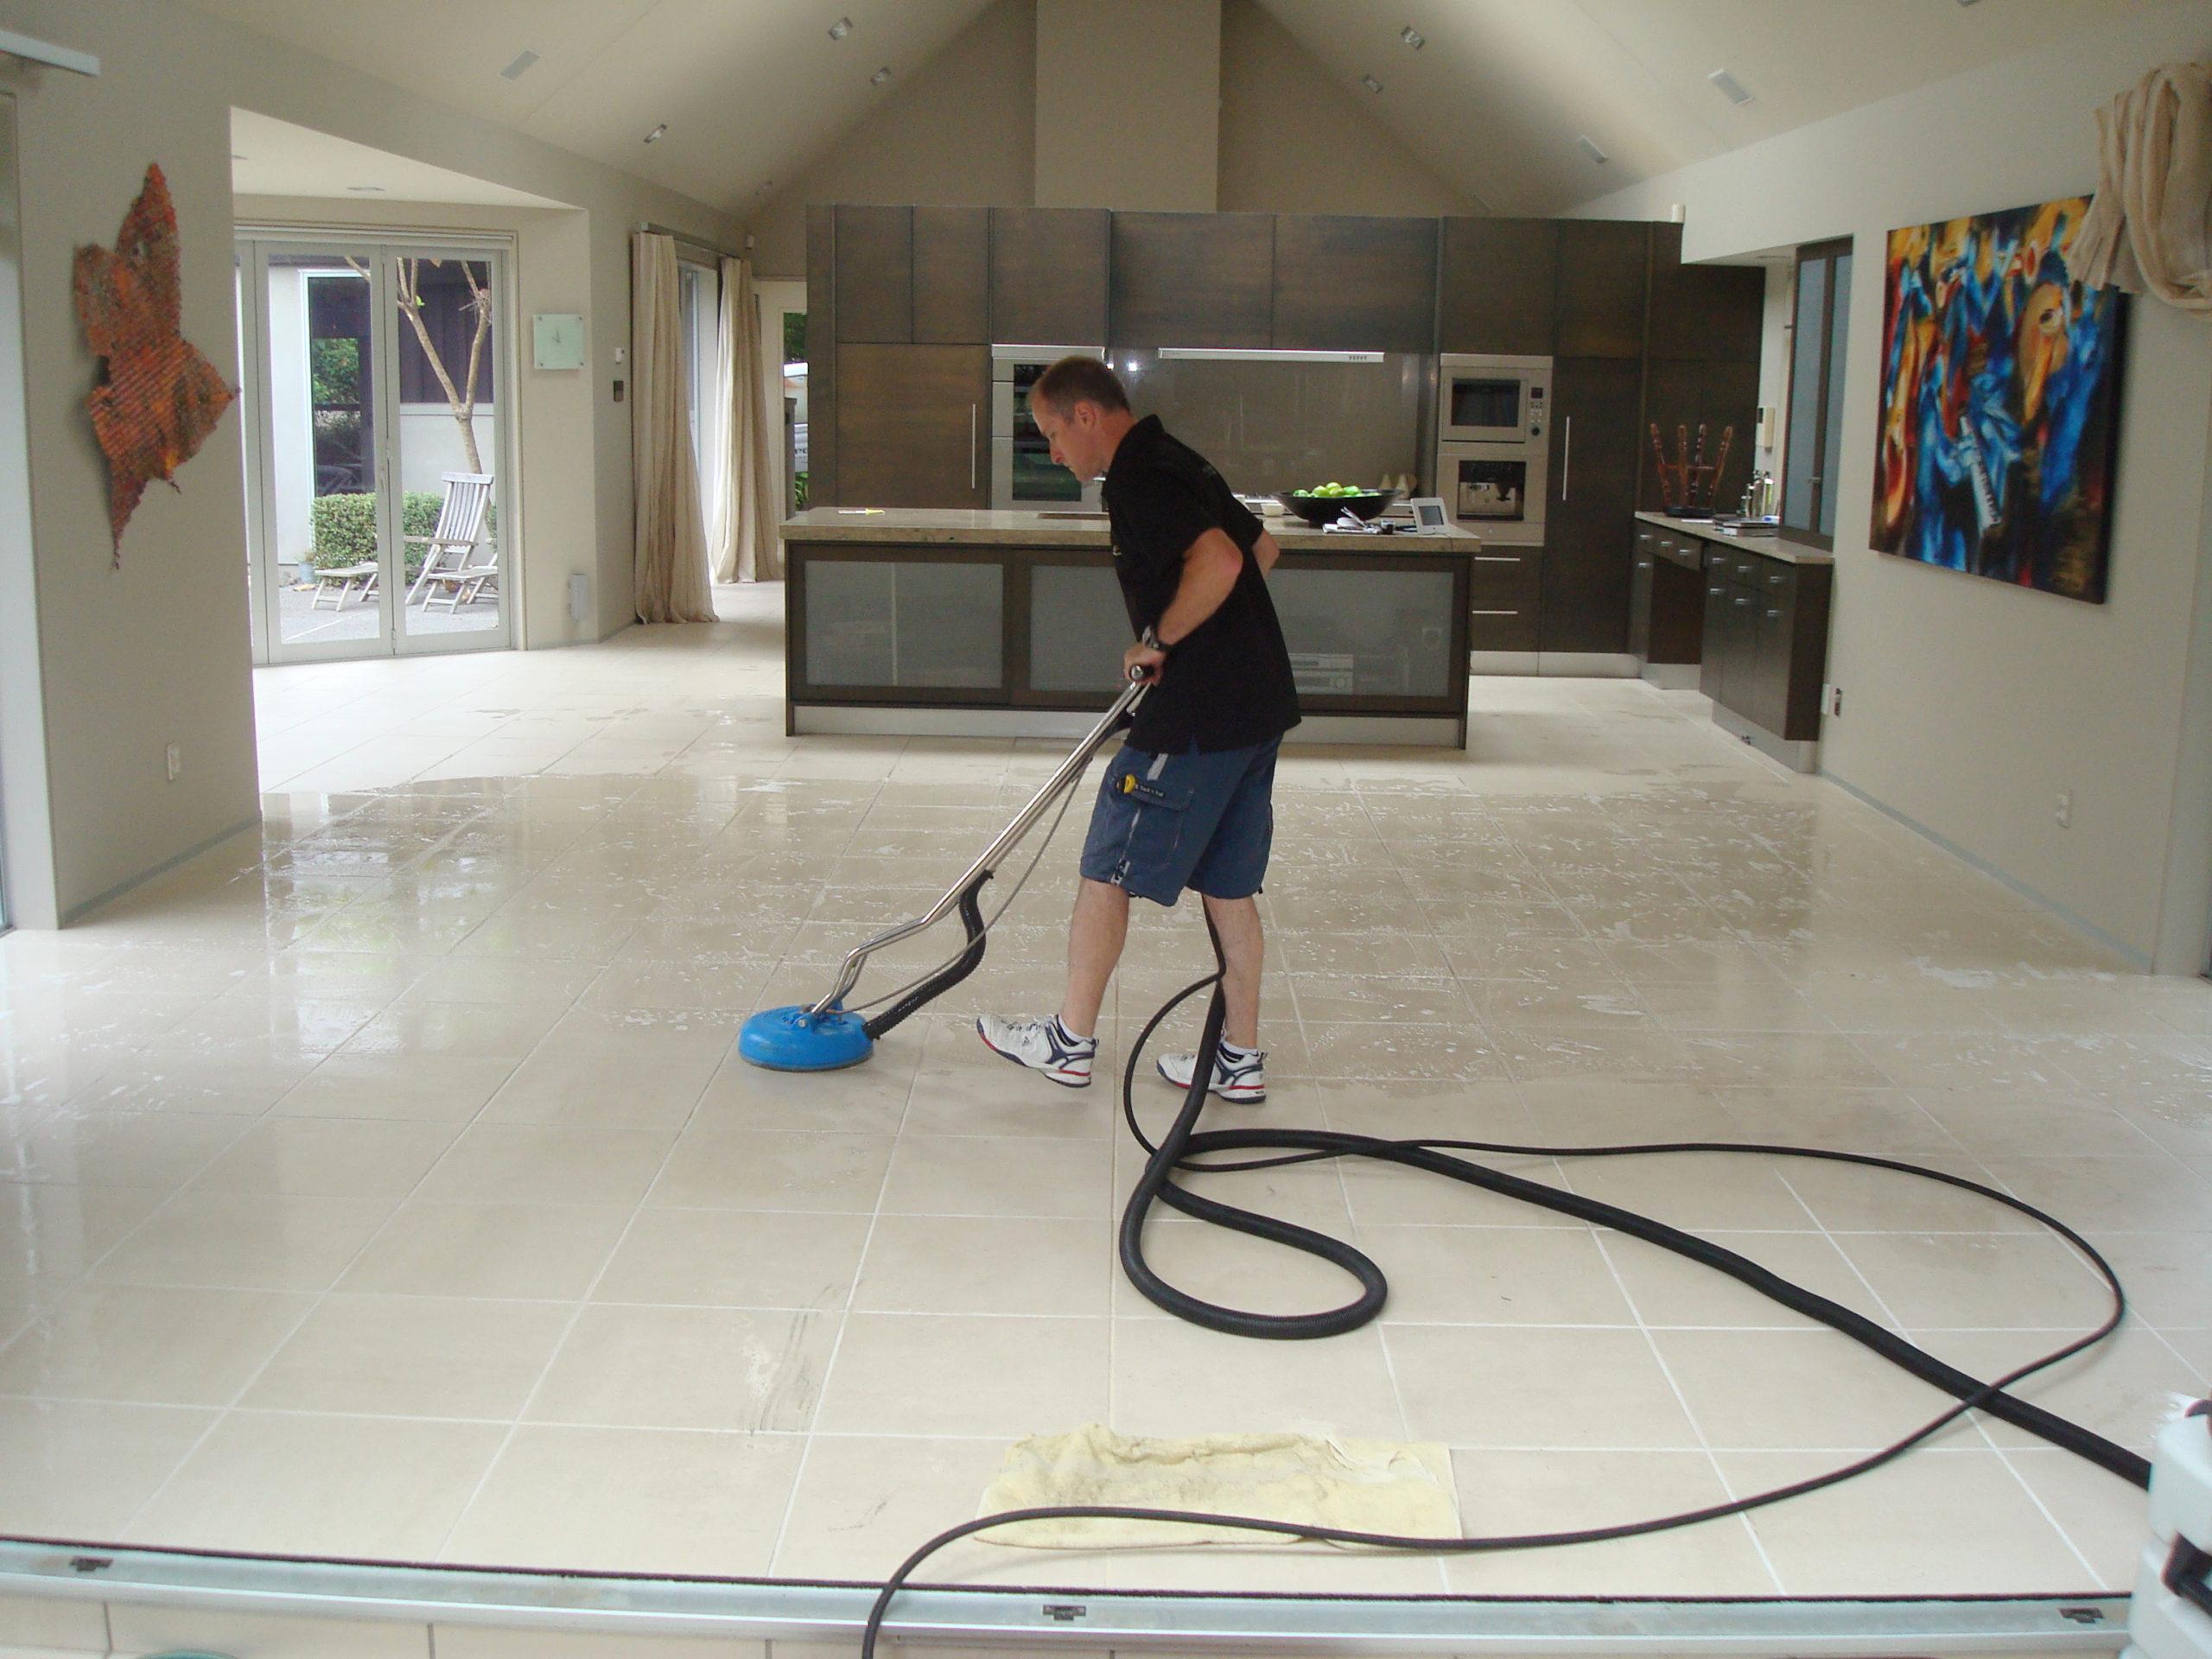 Franchise member cleaning tiles